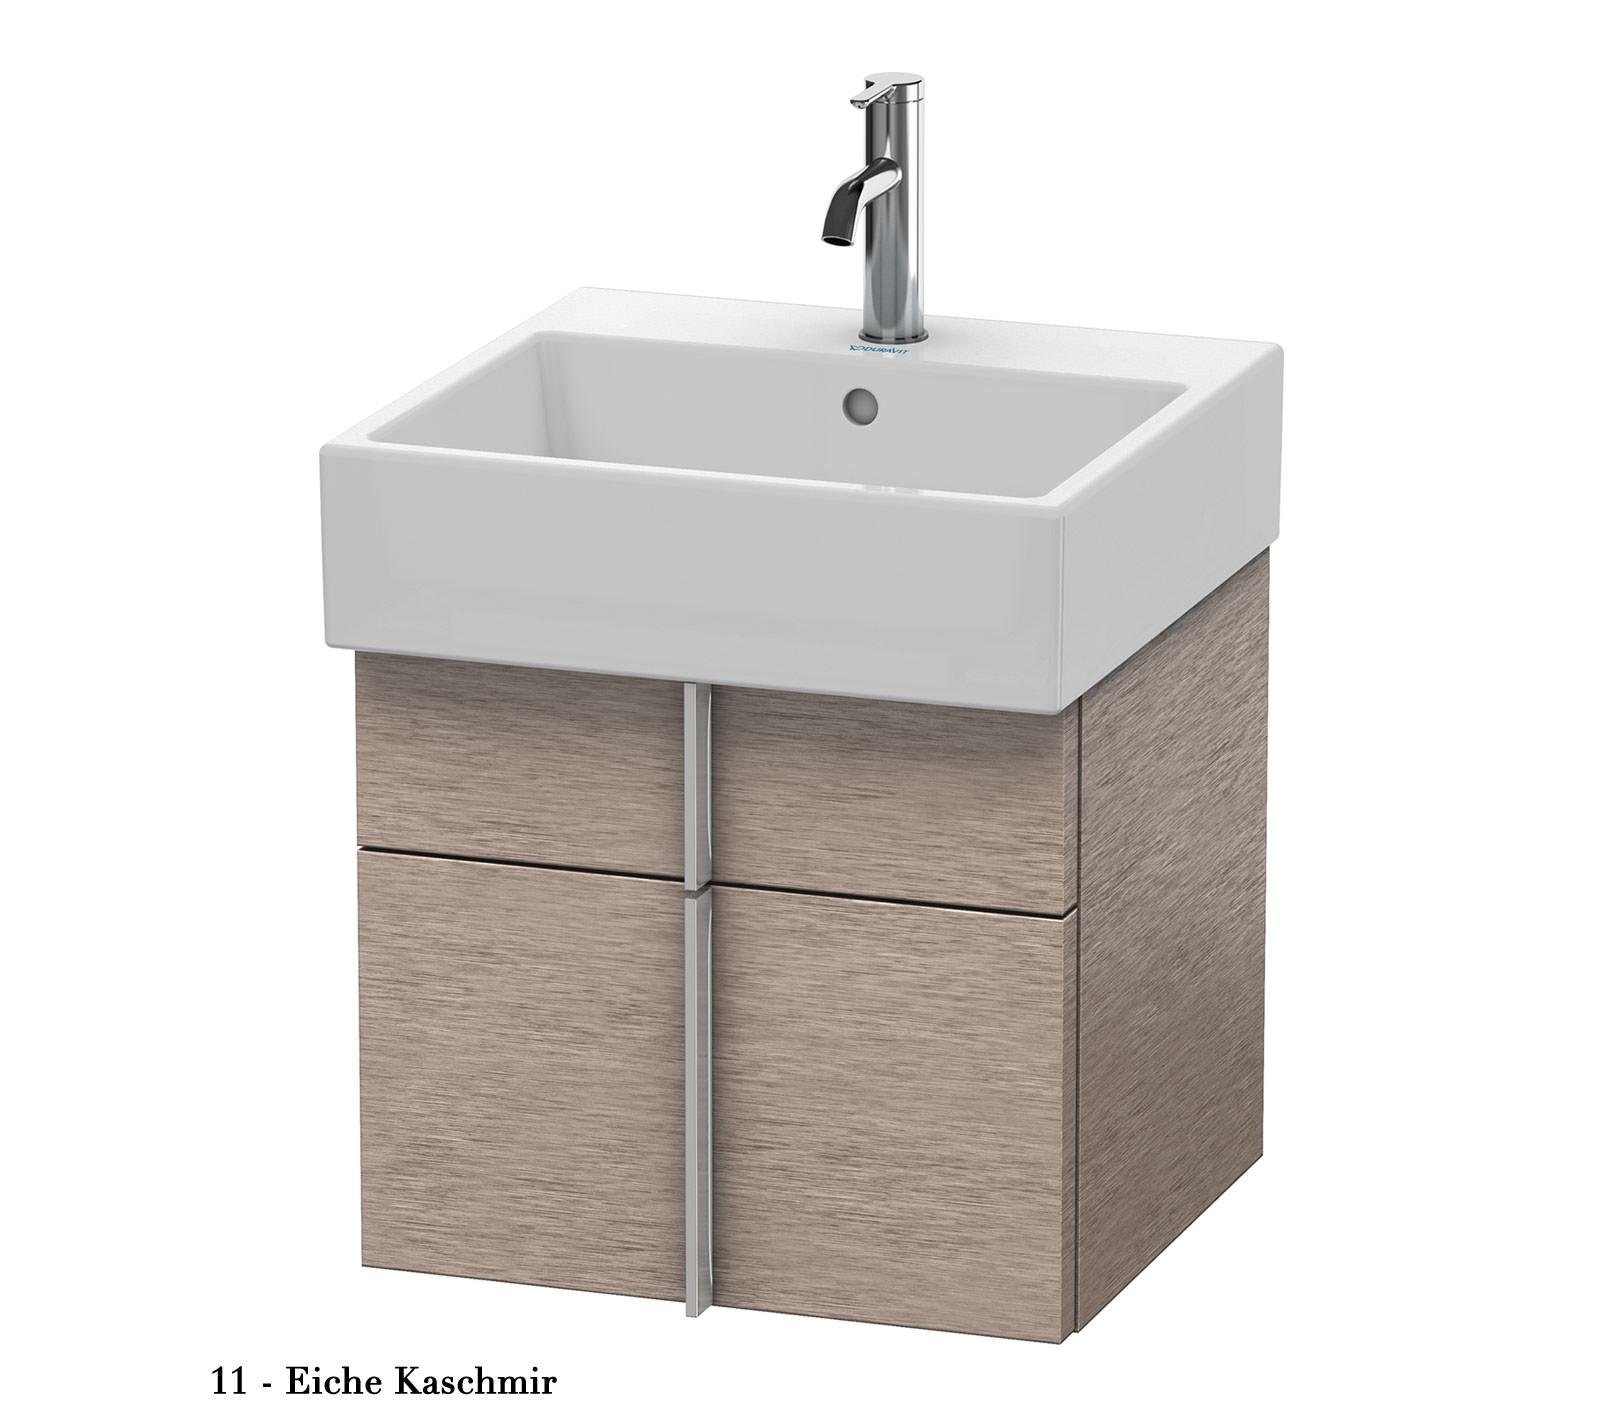 duravit vero air 1 drawer and 1 pull 0ut compartment unit. Black Bedroom Furniture Sets. Home Design Ideas